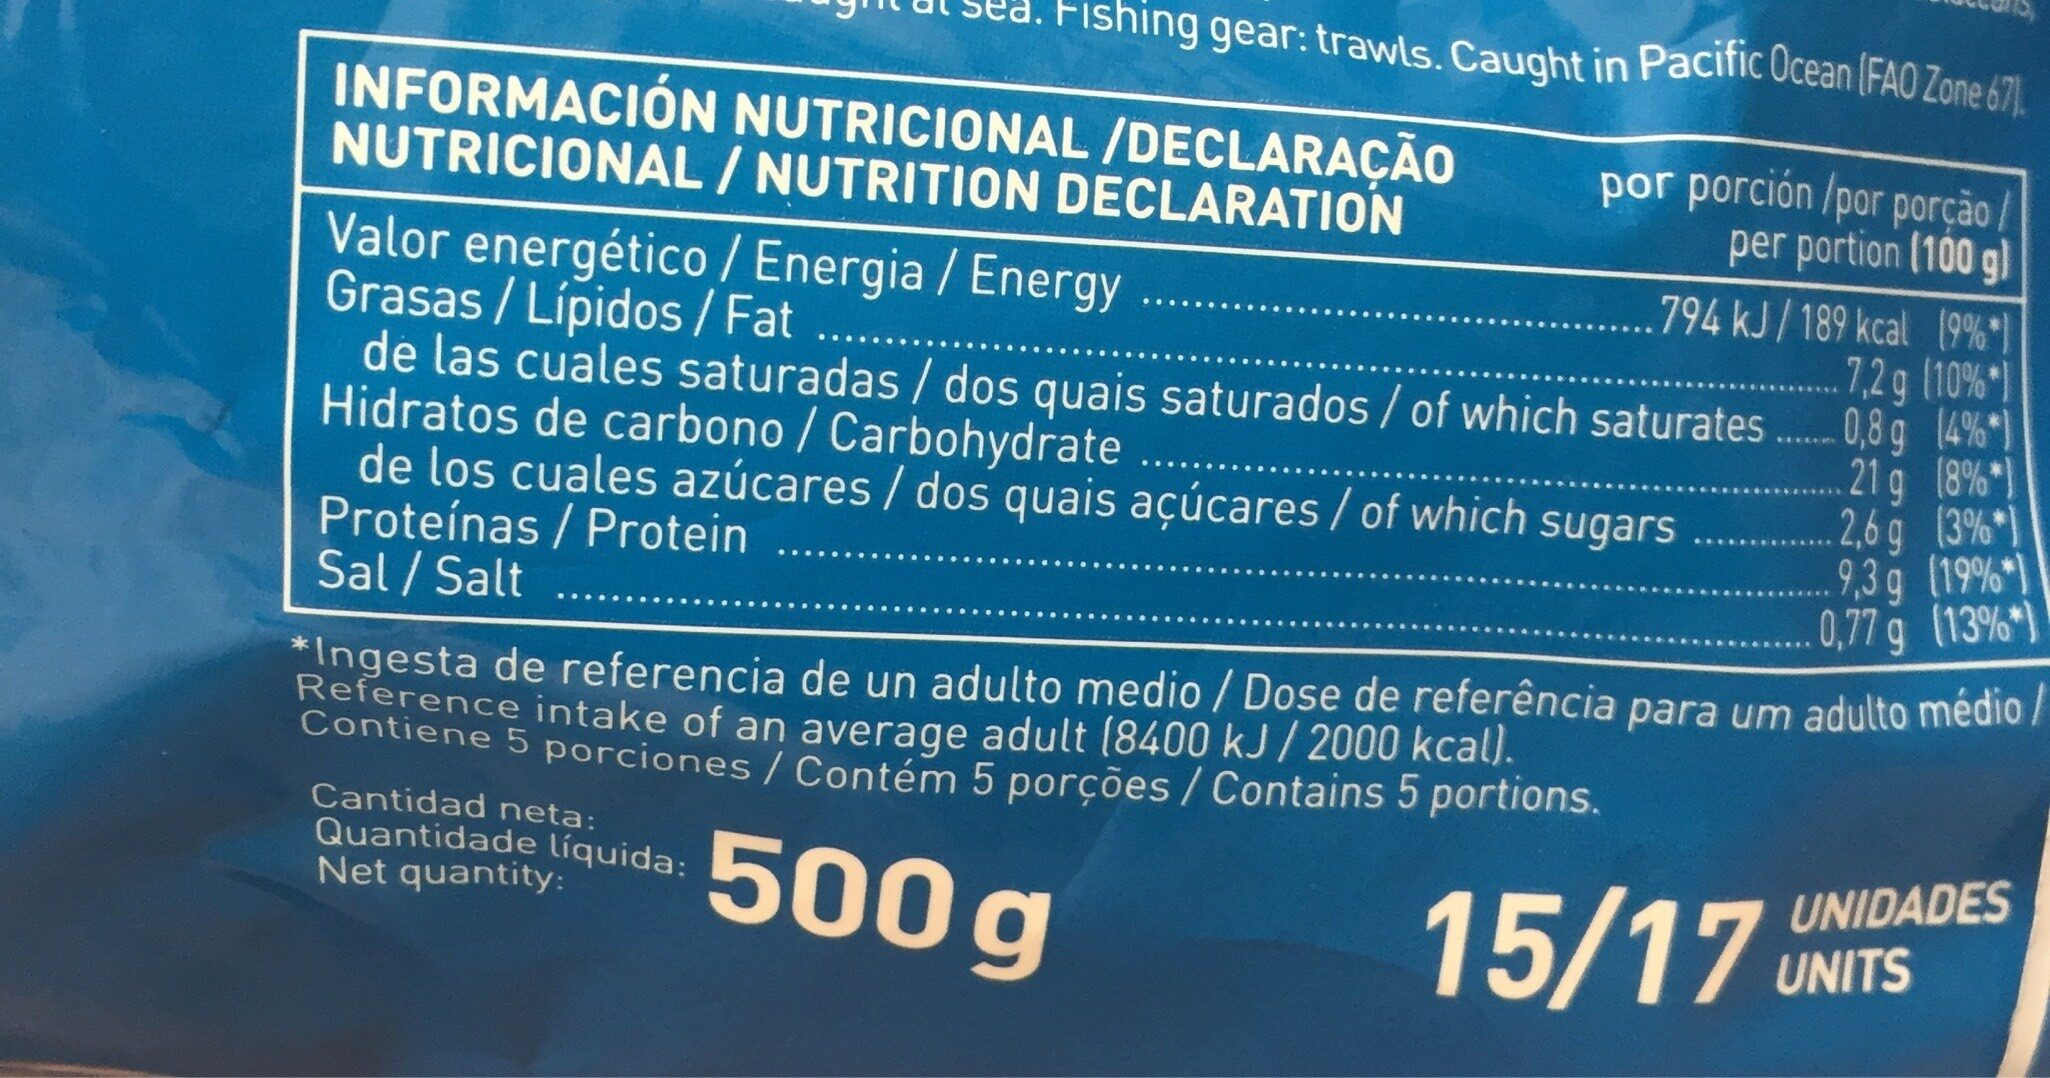 Varitas de merluza empanadas - Informations nutritionnelles - fr